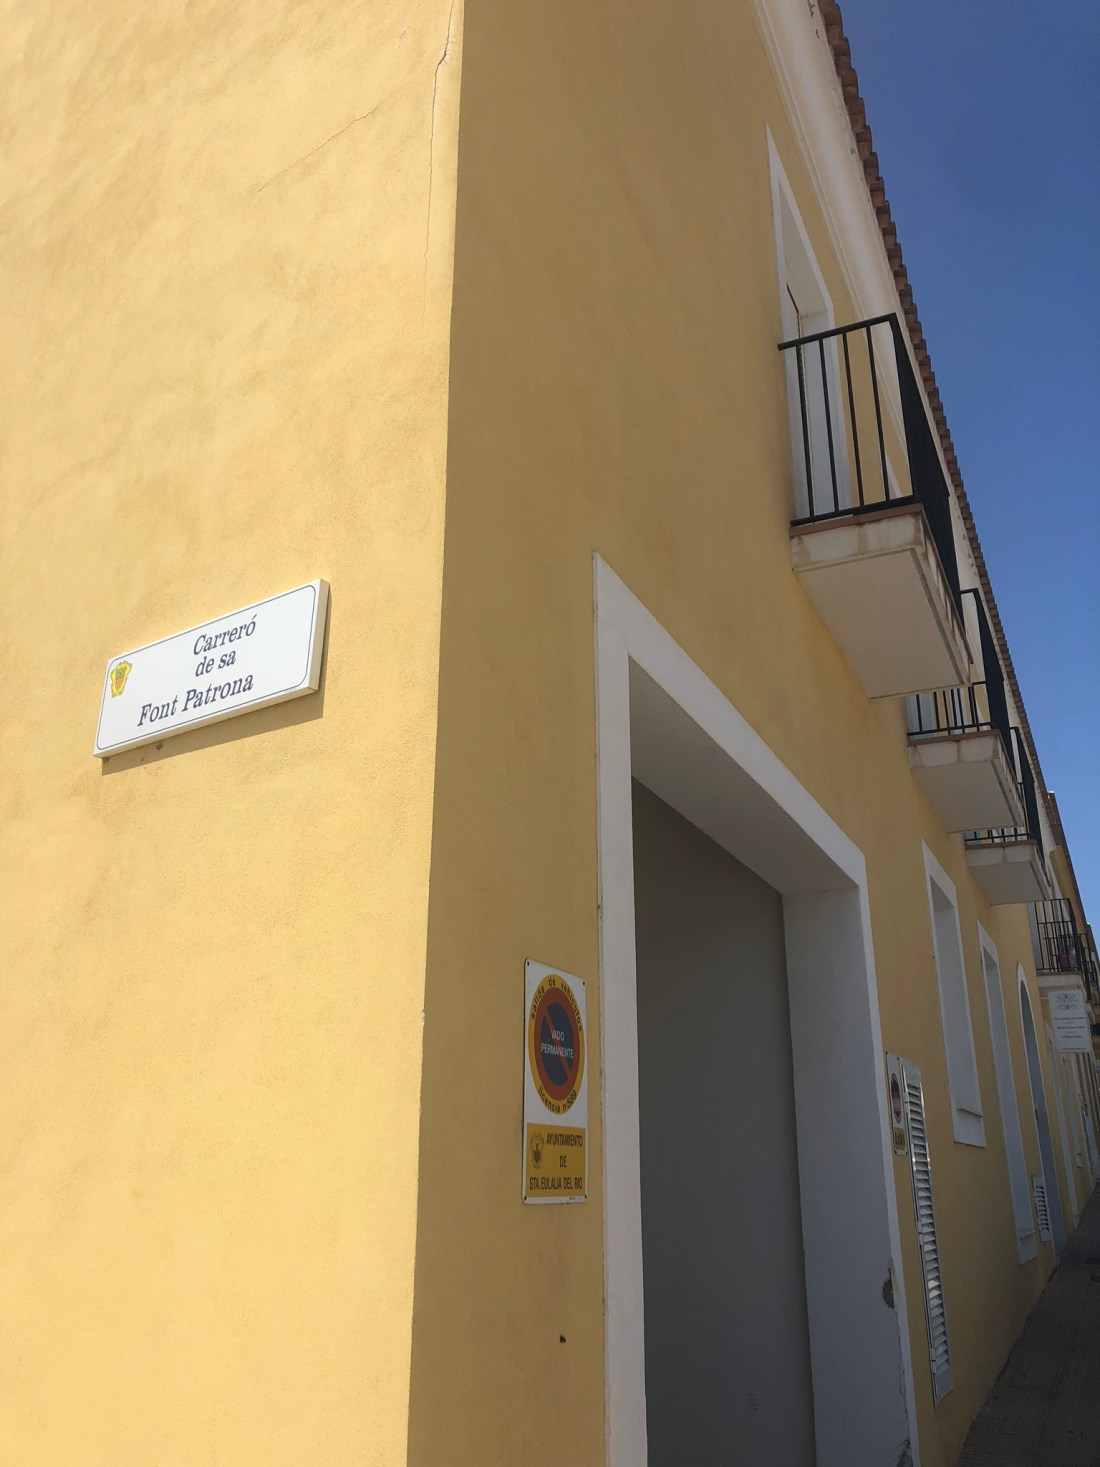 Best places to visit in Ibiza: Architecture in Santa Gertrudis, Ibiza